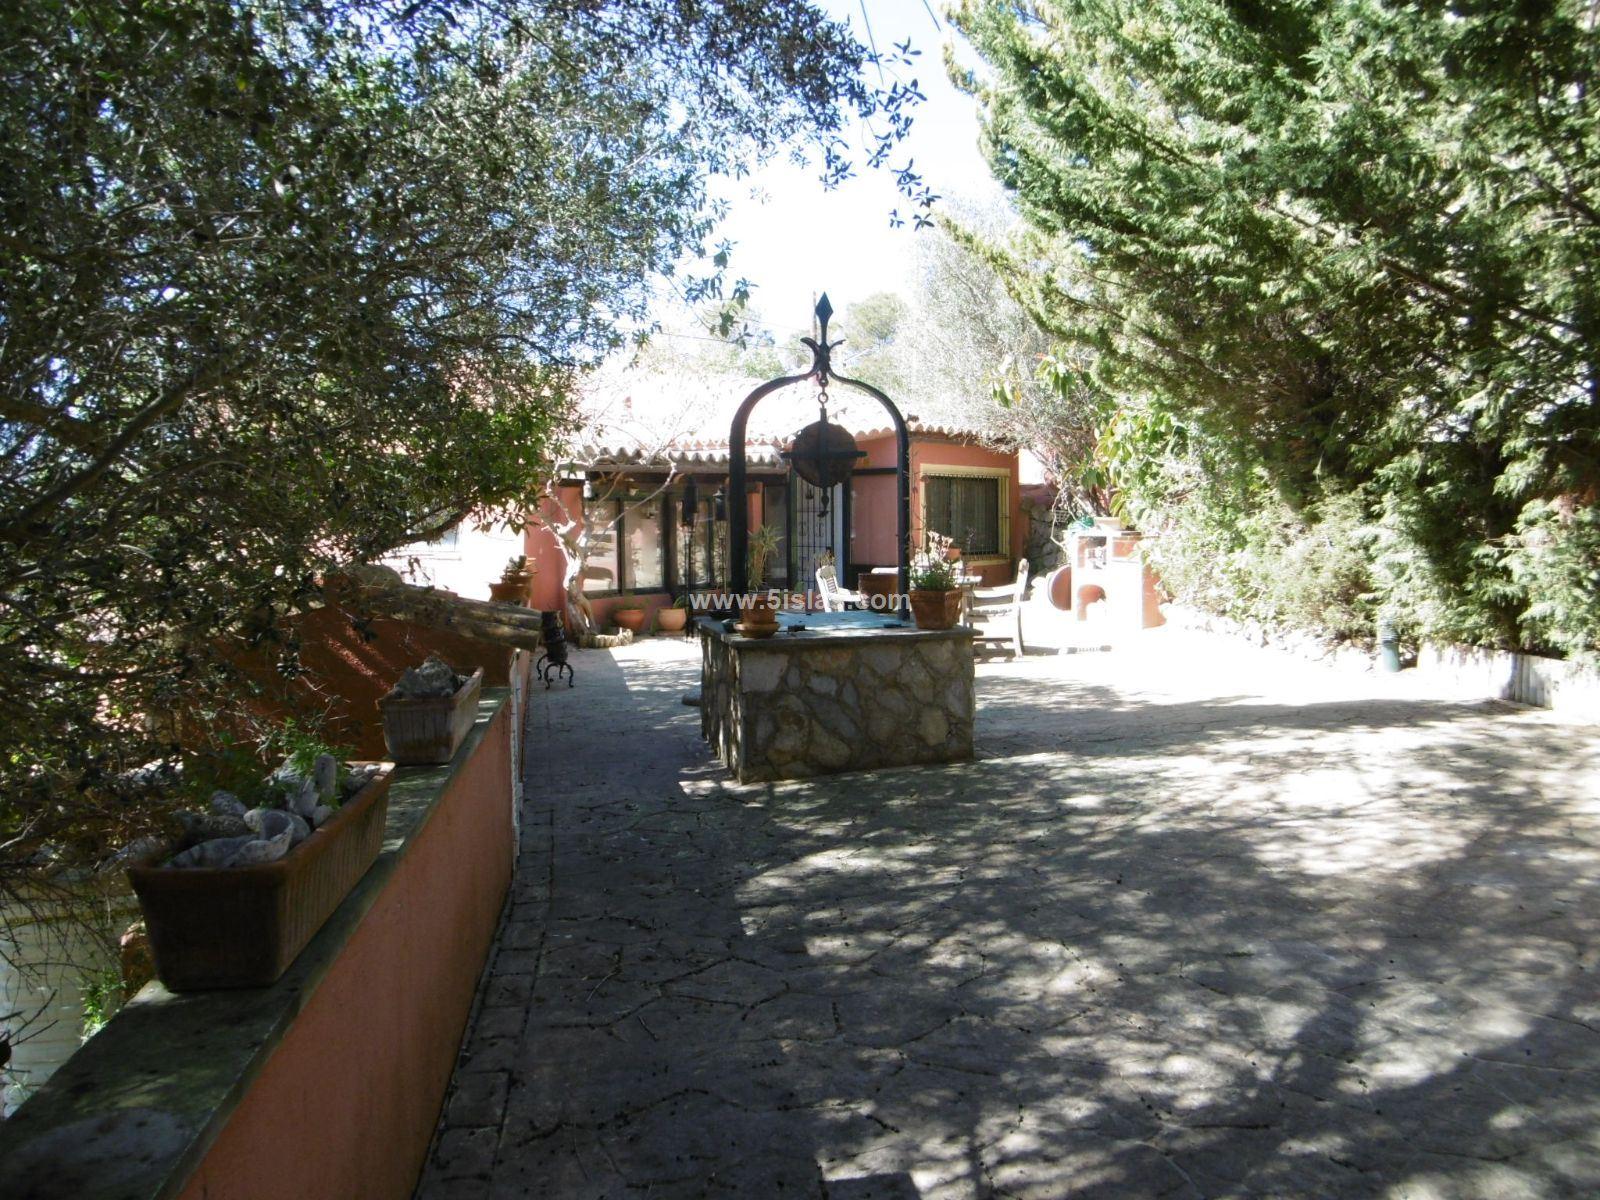 Preciosa casa rústica mallorquina en Calvià